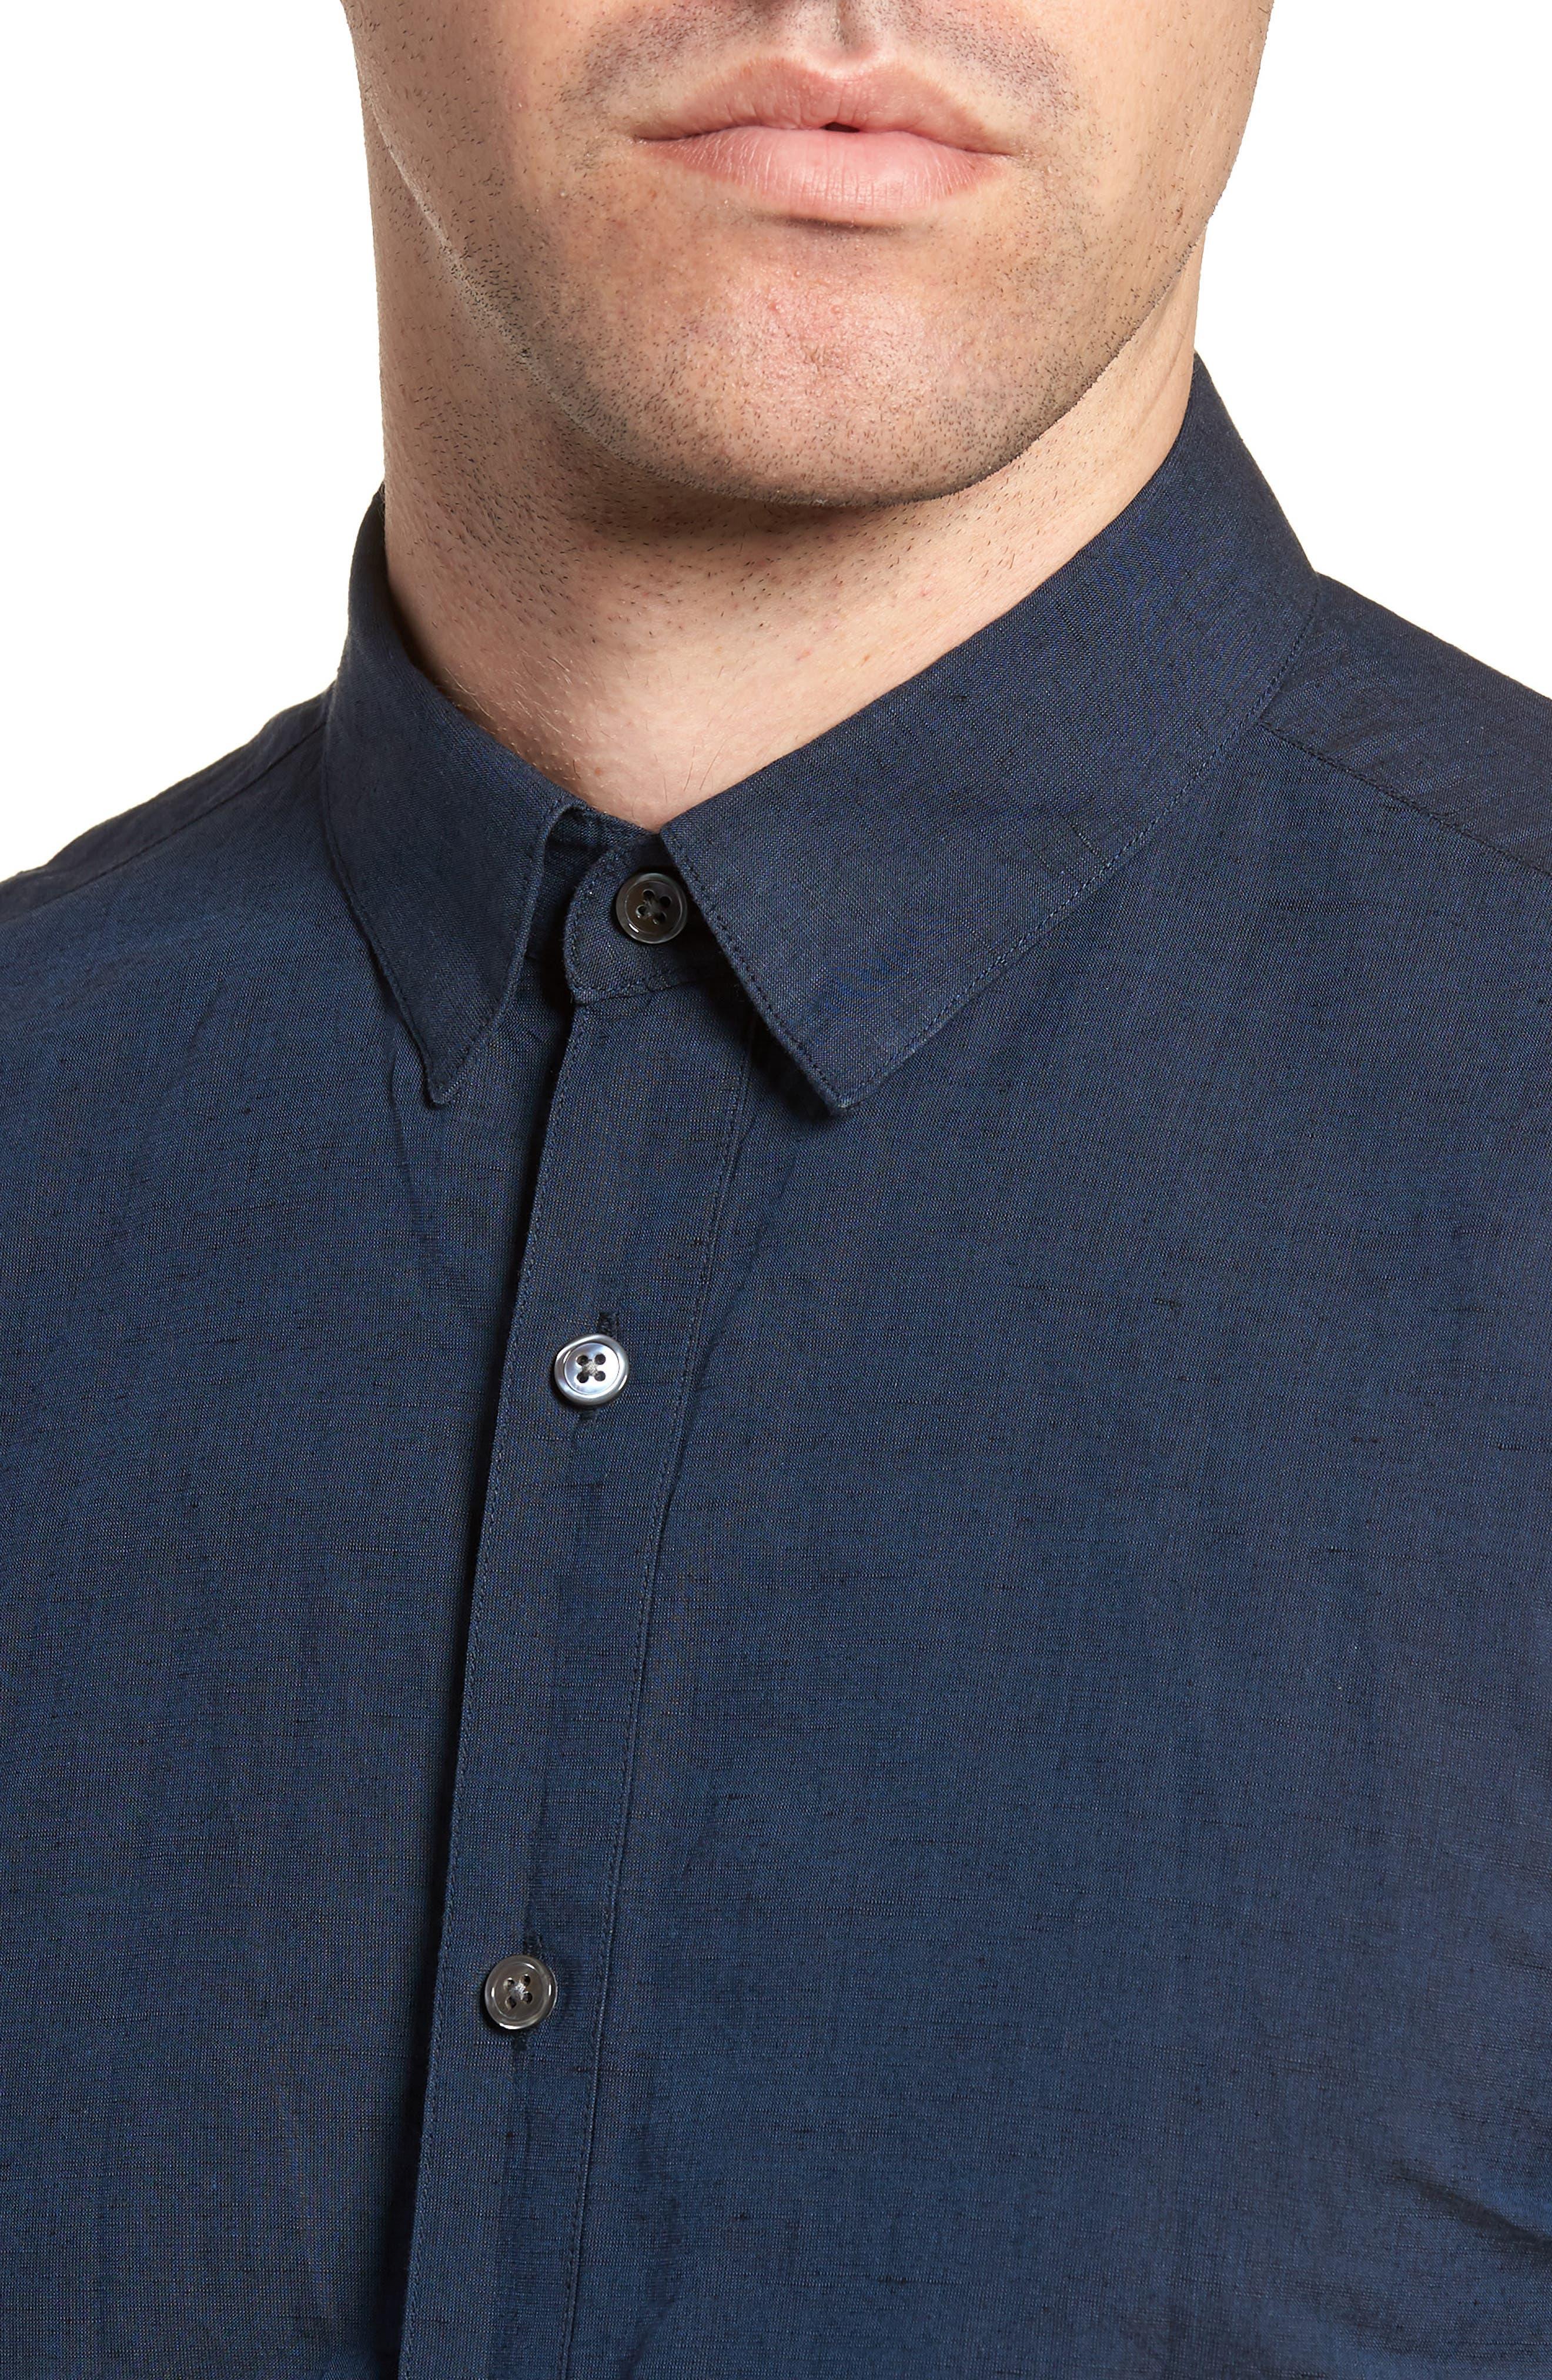 Edward Regular Fit Linen & Cotton Sport Shirt,                             Alternate thumbnail 4, color,                             Finch